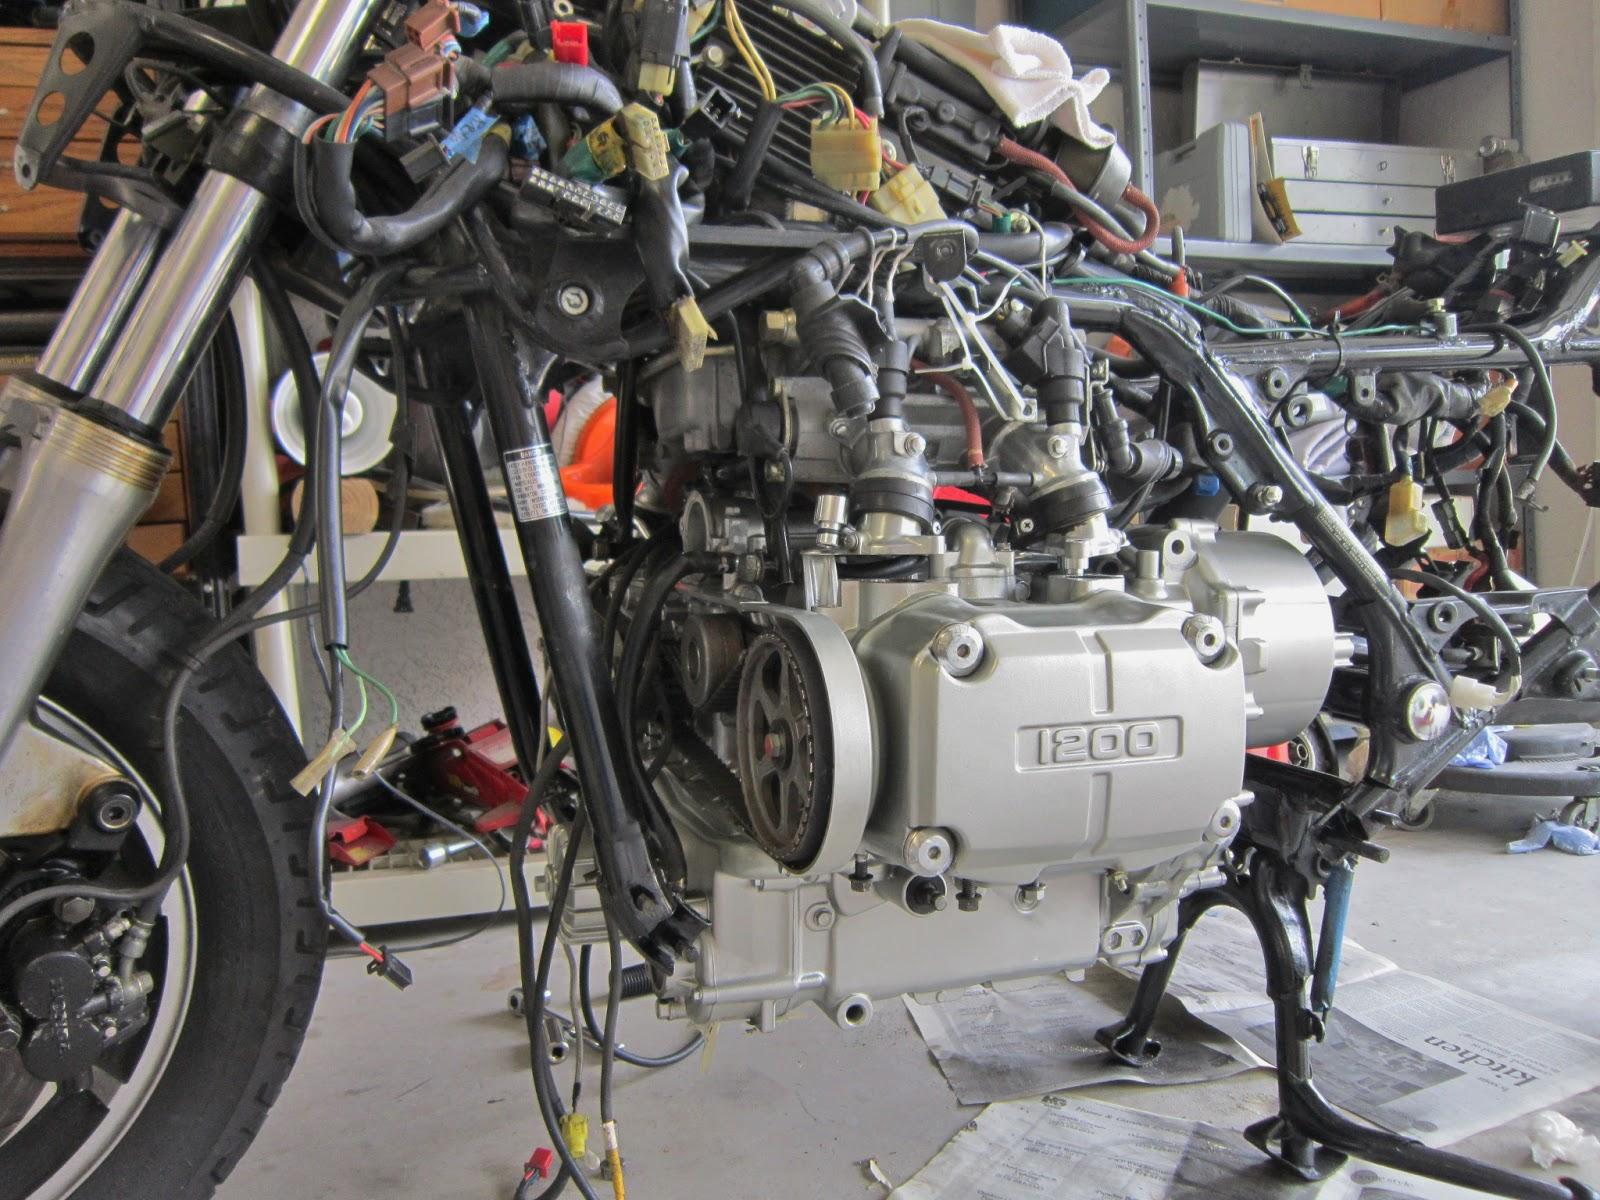 1986 Honda Goldwing Parts 1982 Gl1200 Aspencade Wiring Diagram Usa Sei Factory Assembly Error